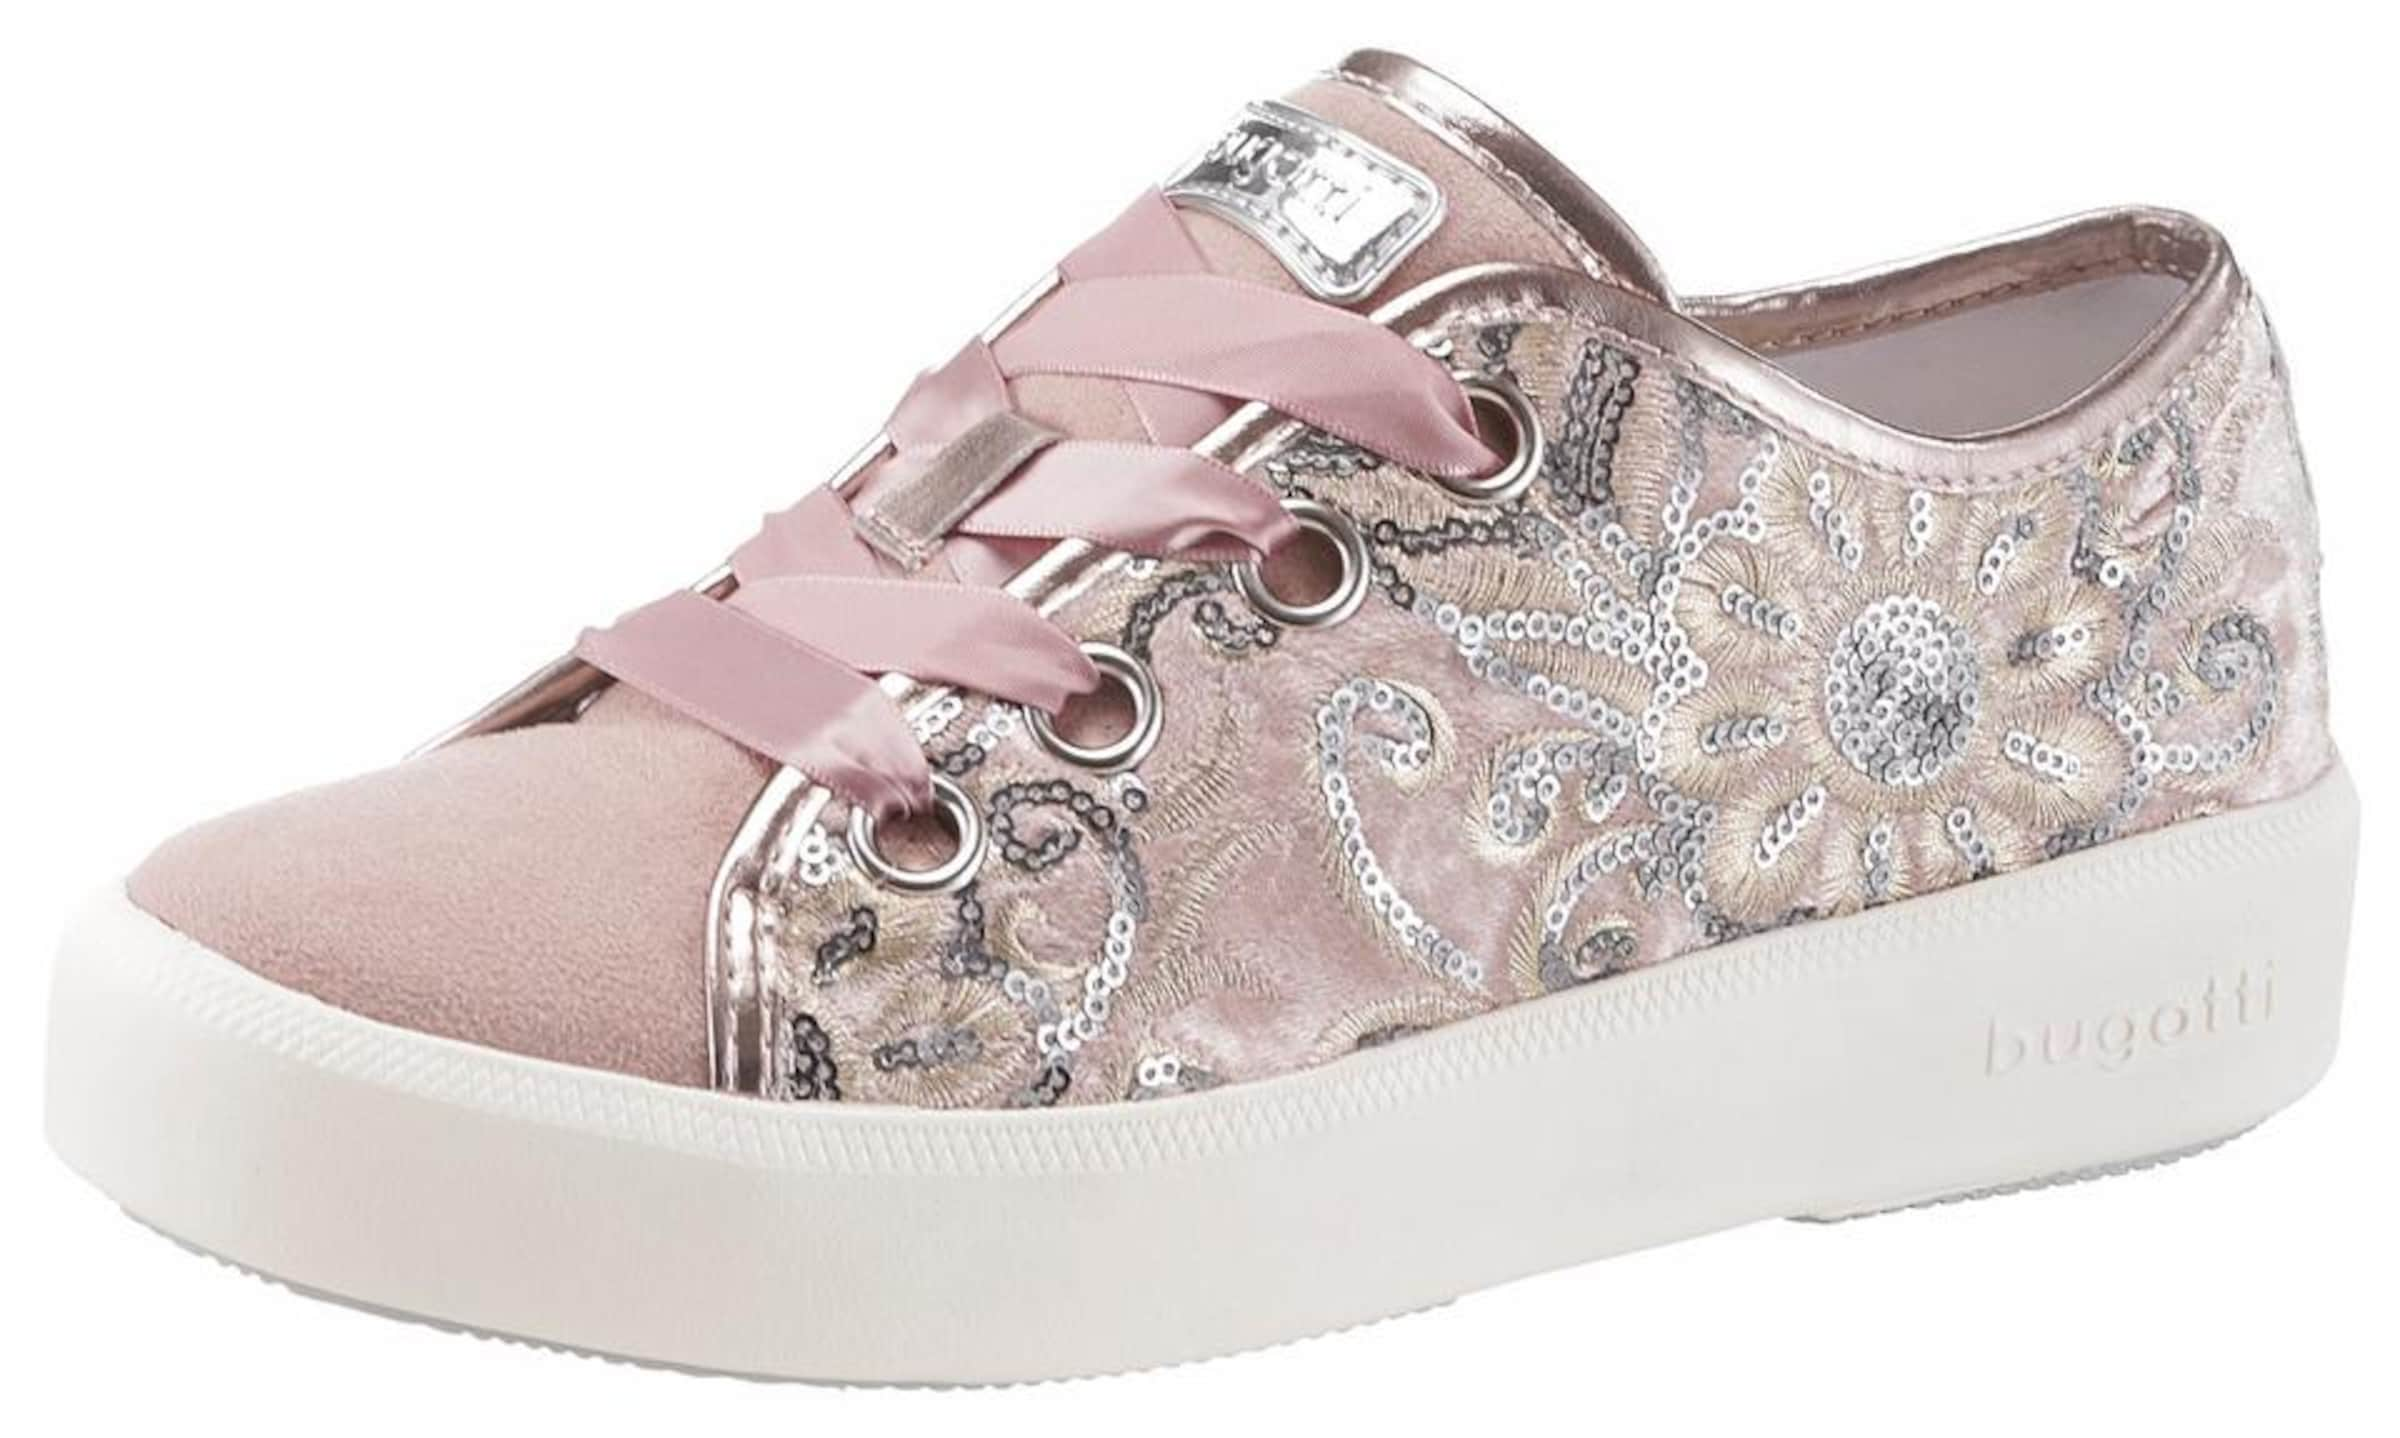 Haltbare Mode billige Schuhe bugatti | Sneaker Schuhe Gut getragene Schuhe